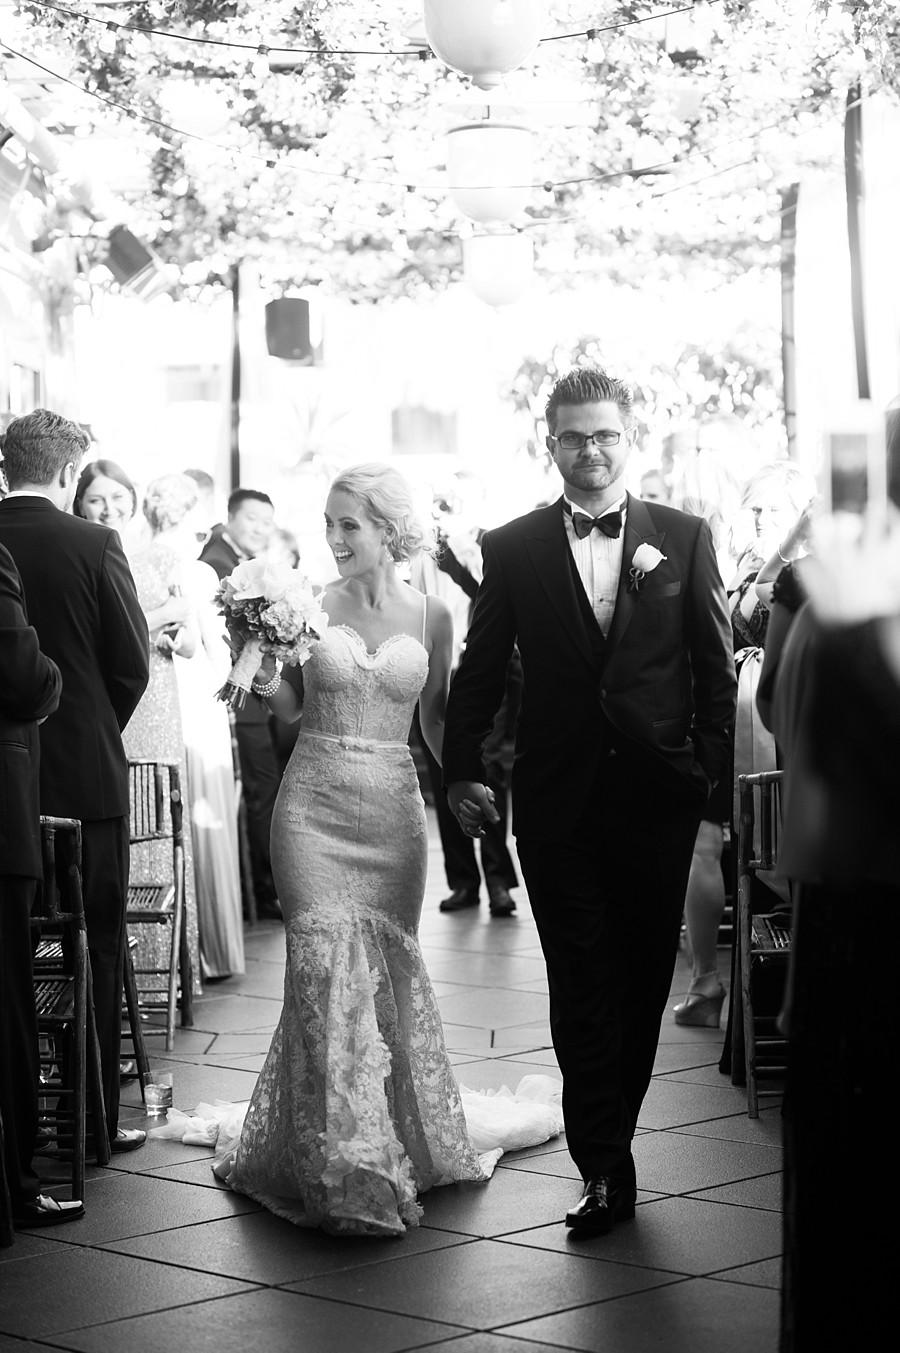 Gramercy_Park_Hotel_Wedding_EL_23.jpg